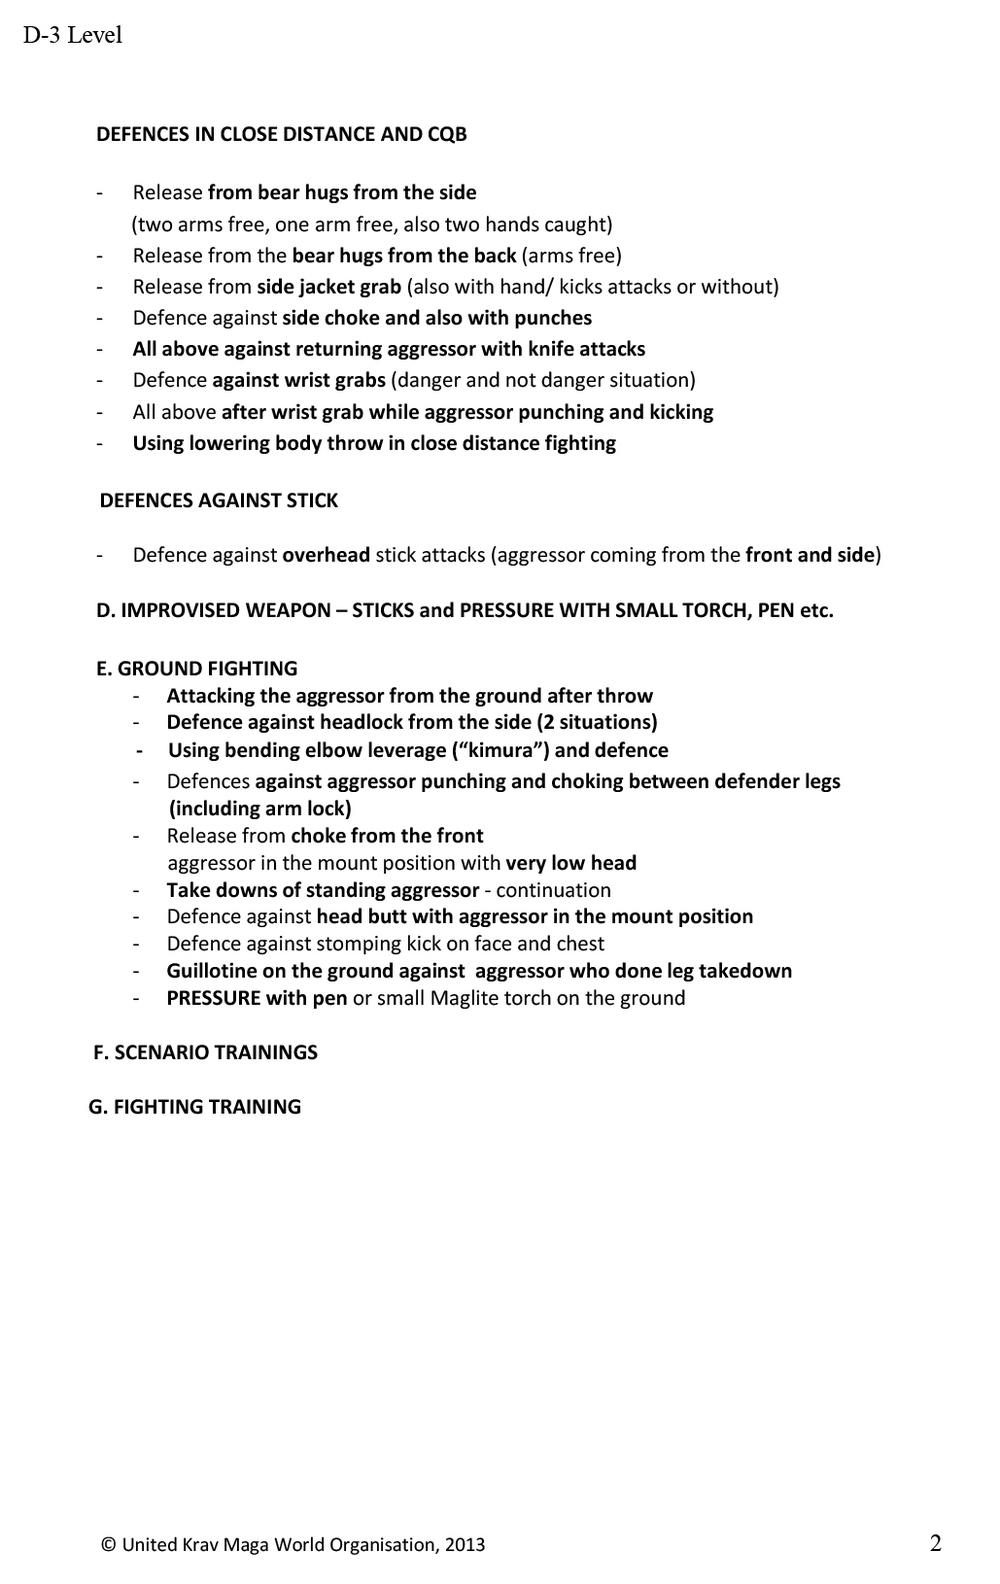 D3_ENGLISH.pdf-2.jpg